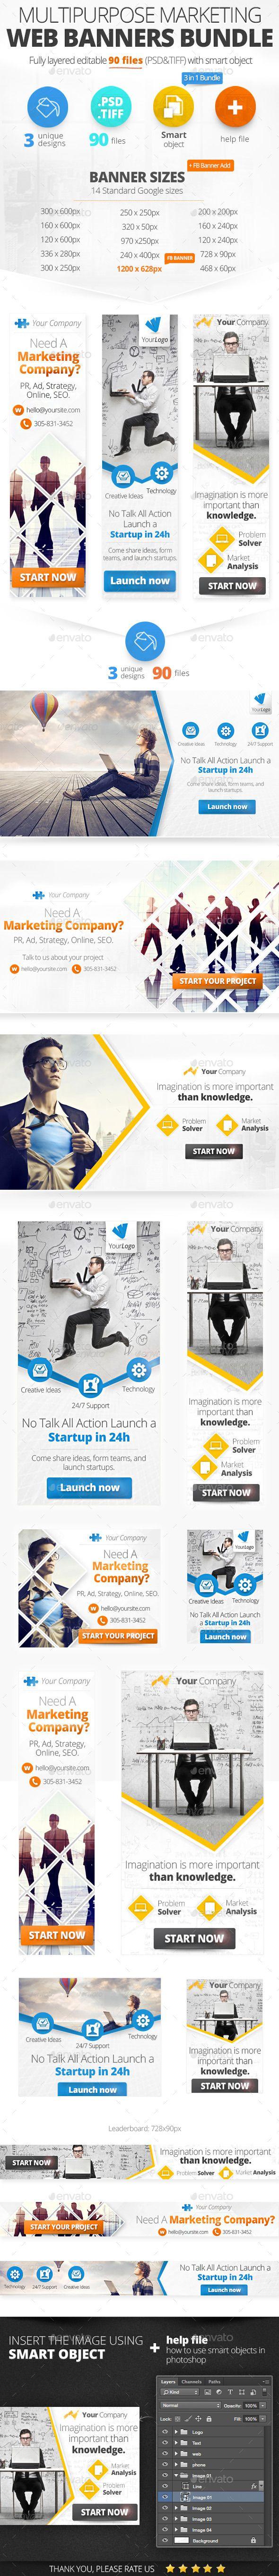 Multipurpose Marketing Web Banners & FB Banner Tempalte #design #ads Download: http://graphicriver.net/item/multipurpose-marketing-web-banners-fb-banner/12926330?ref=ksioks